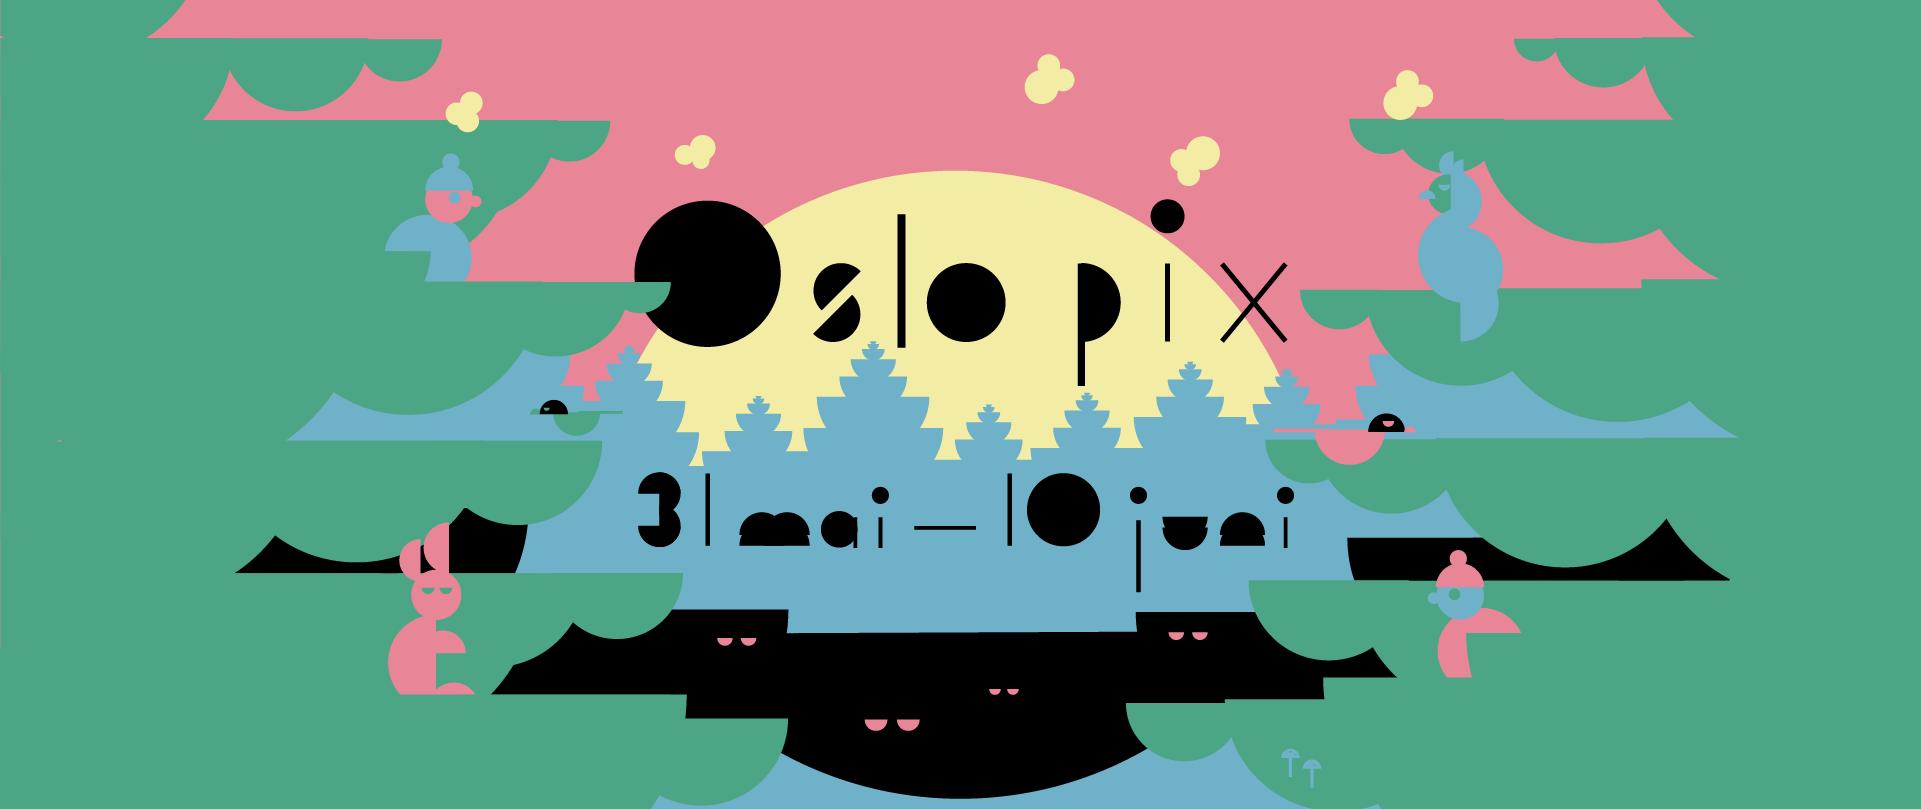 OPX2021 web desktop